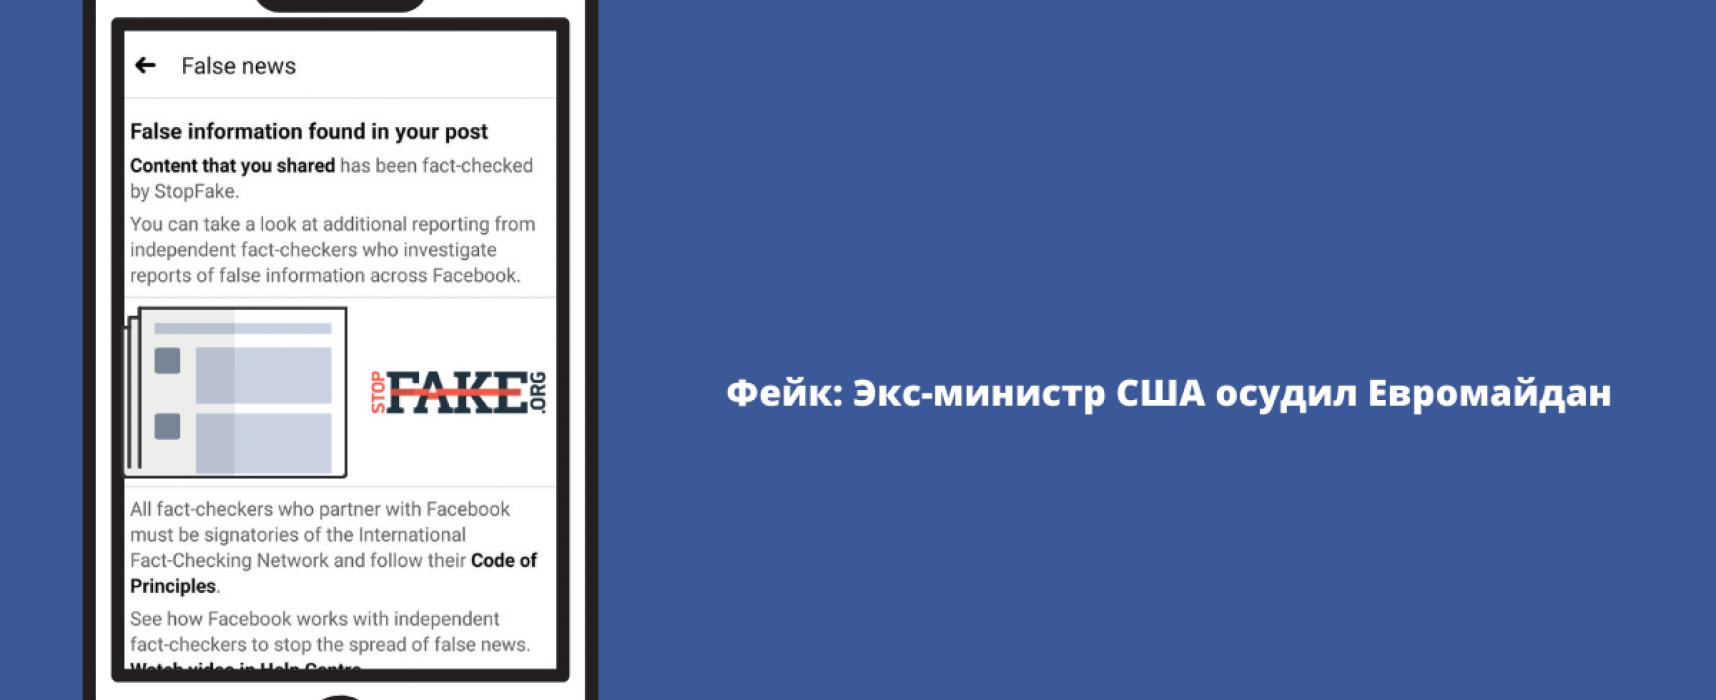 Фейк: Экс-министр США осудил Евромайдан